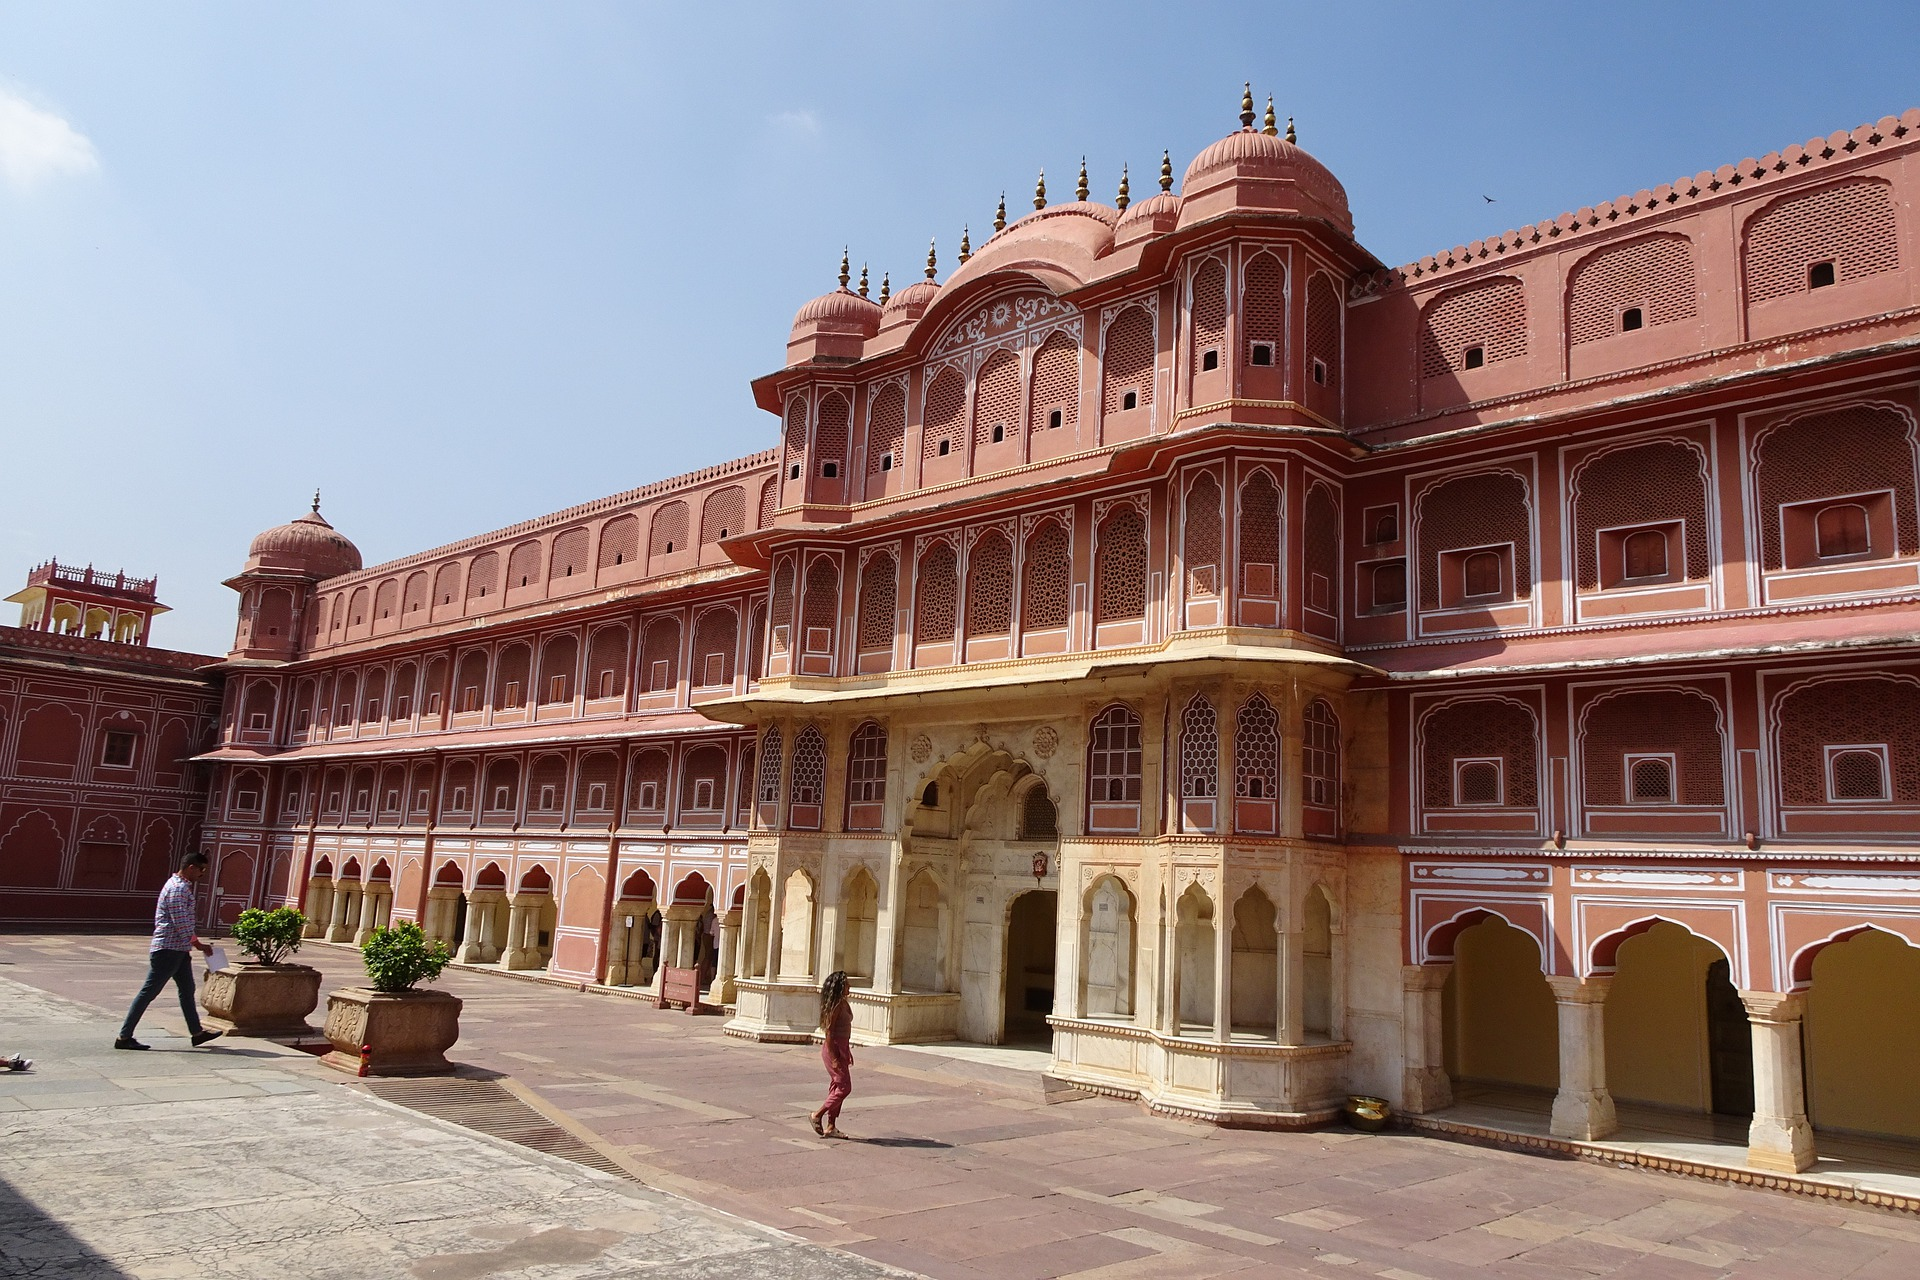 City Palace, Royal palace in India